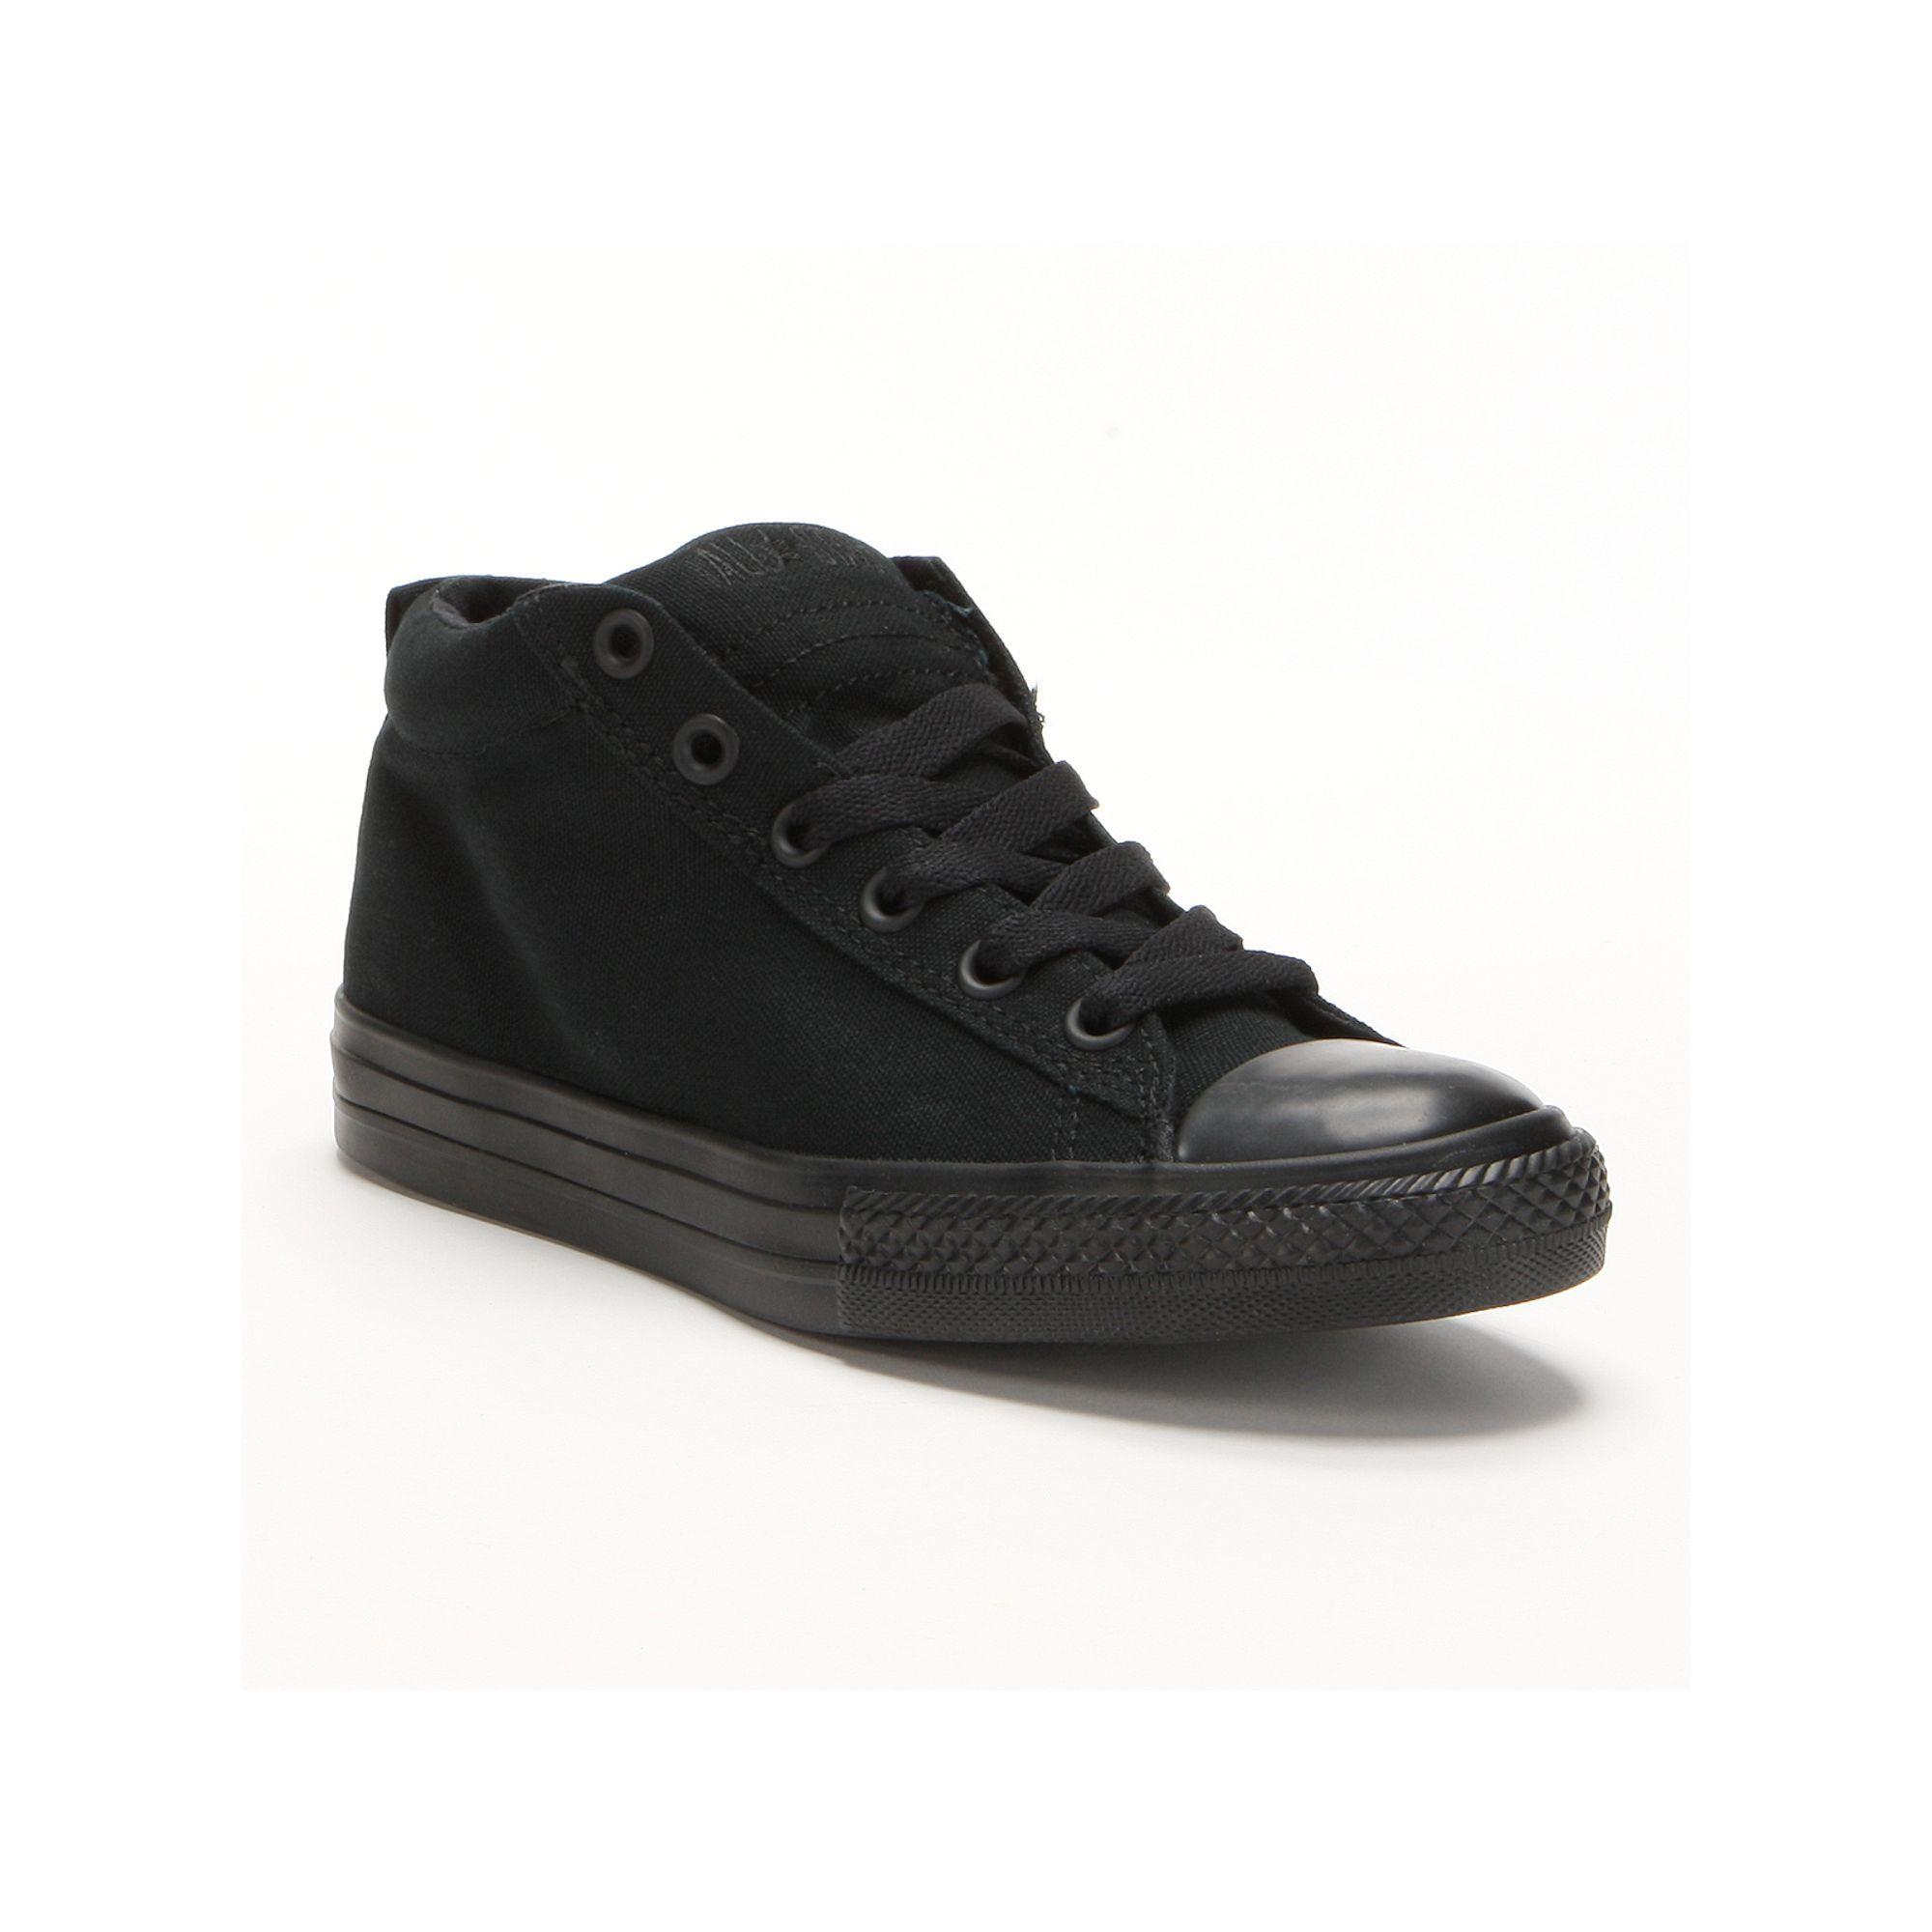 converse chuck taylor white size 6